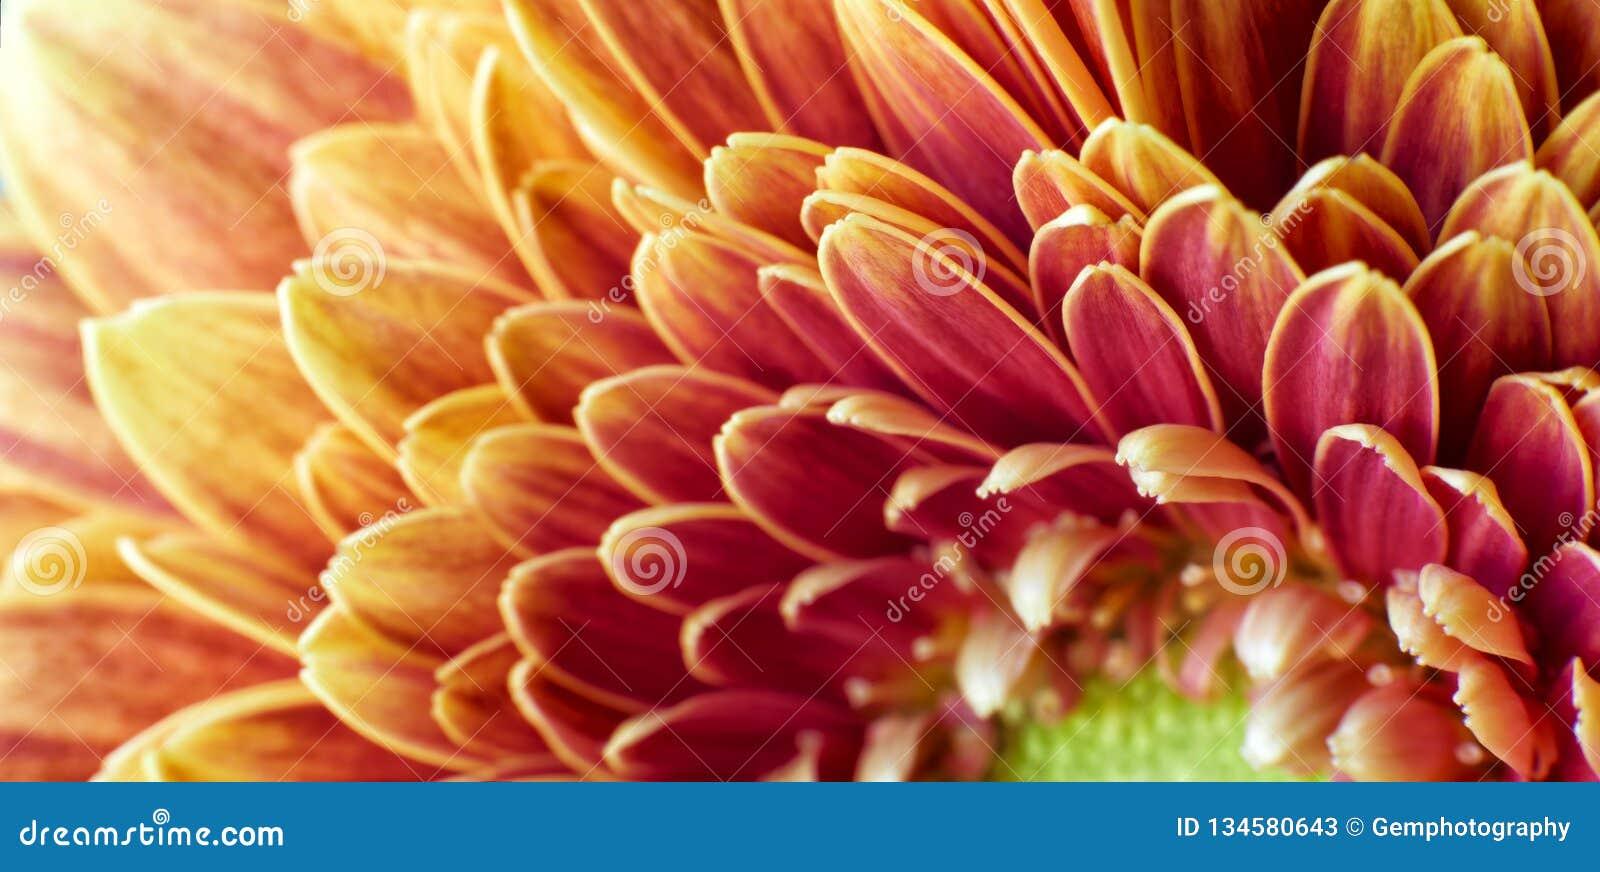 Golden Chrysanthemum